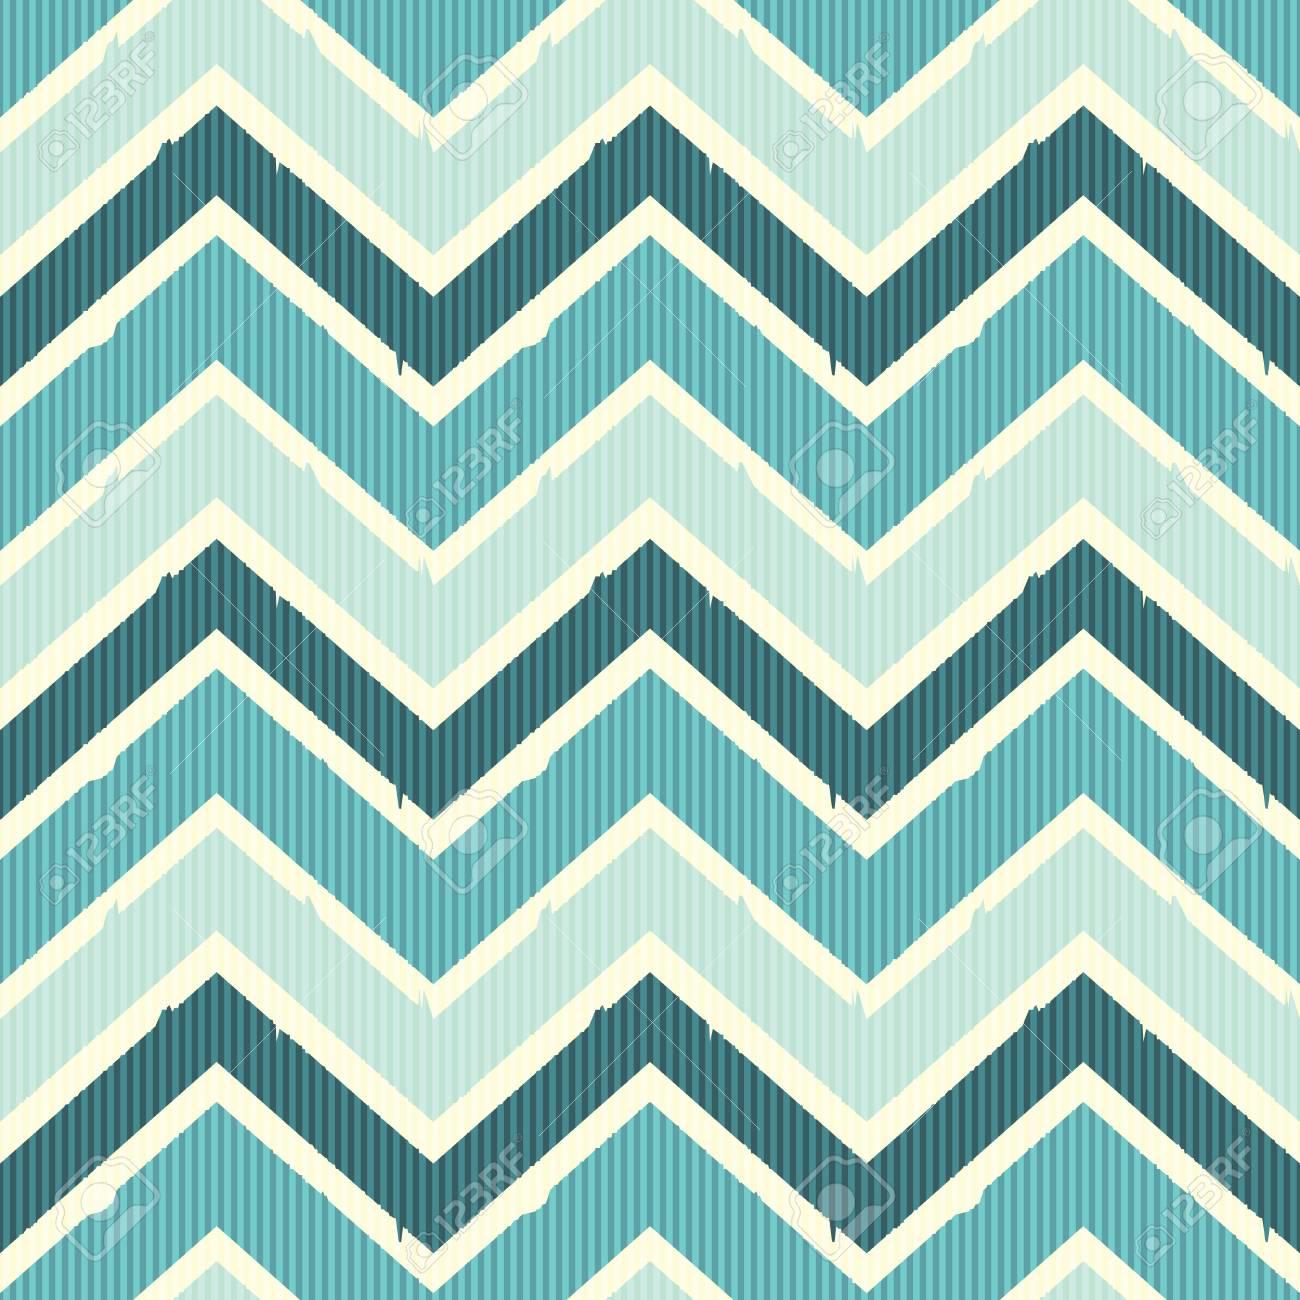 Seamless chevron pattern in sea colors Stock Vector - 20745845